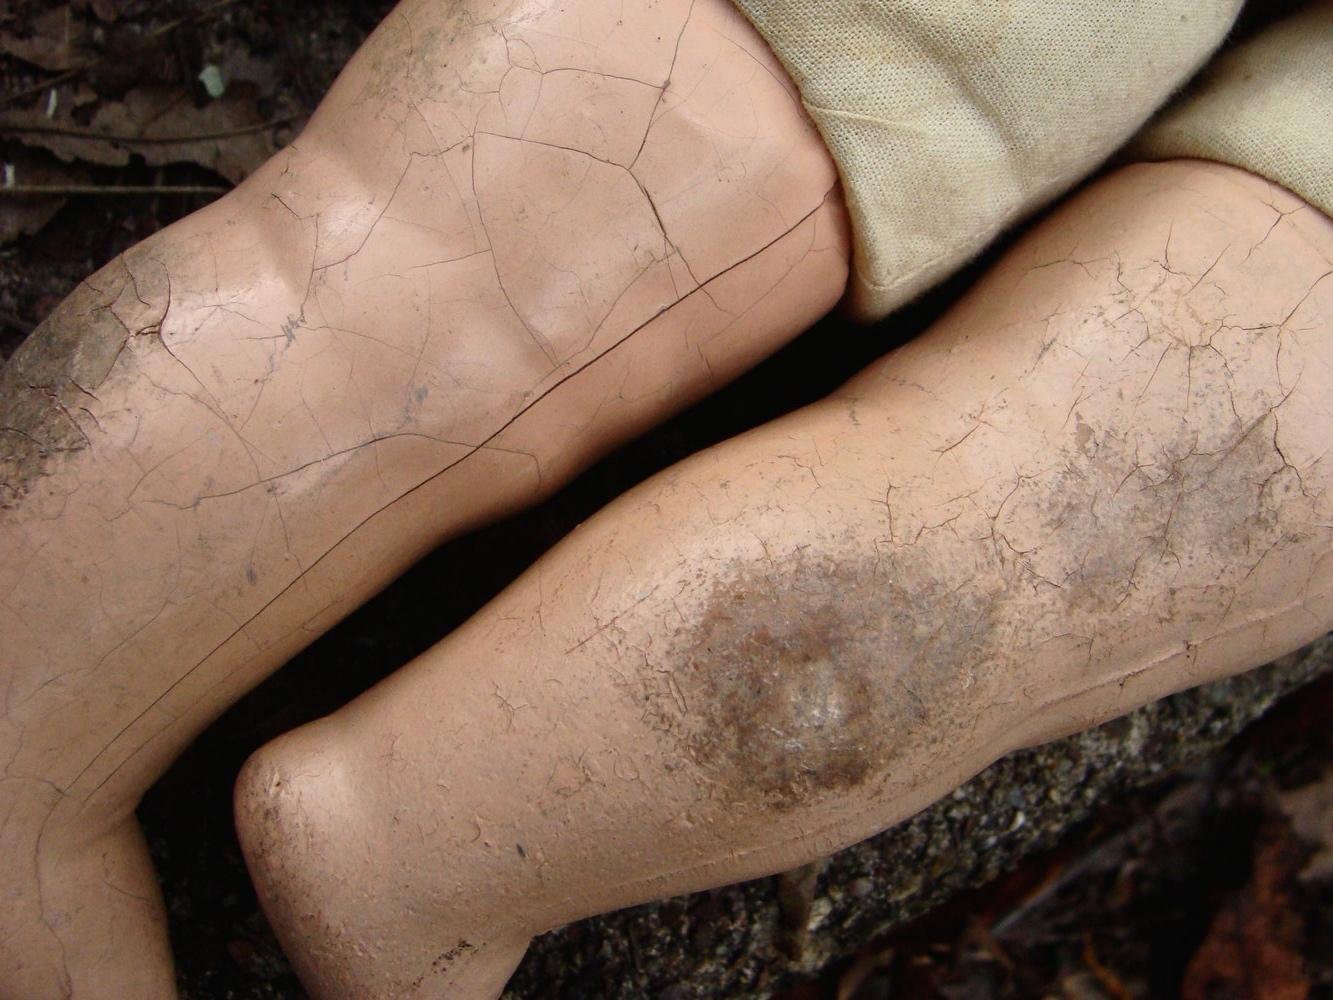 bruises+7572.jpg